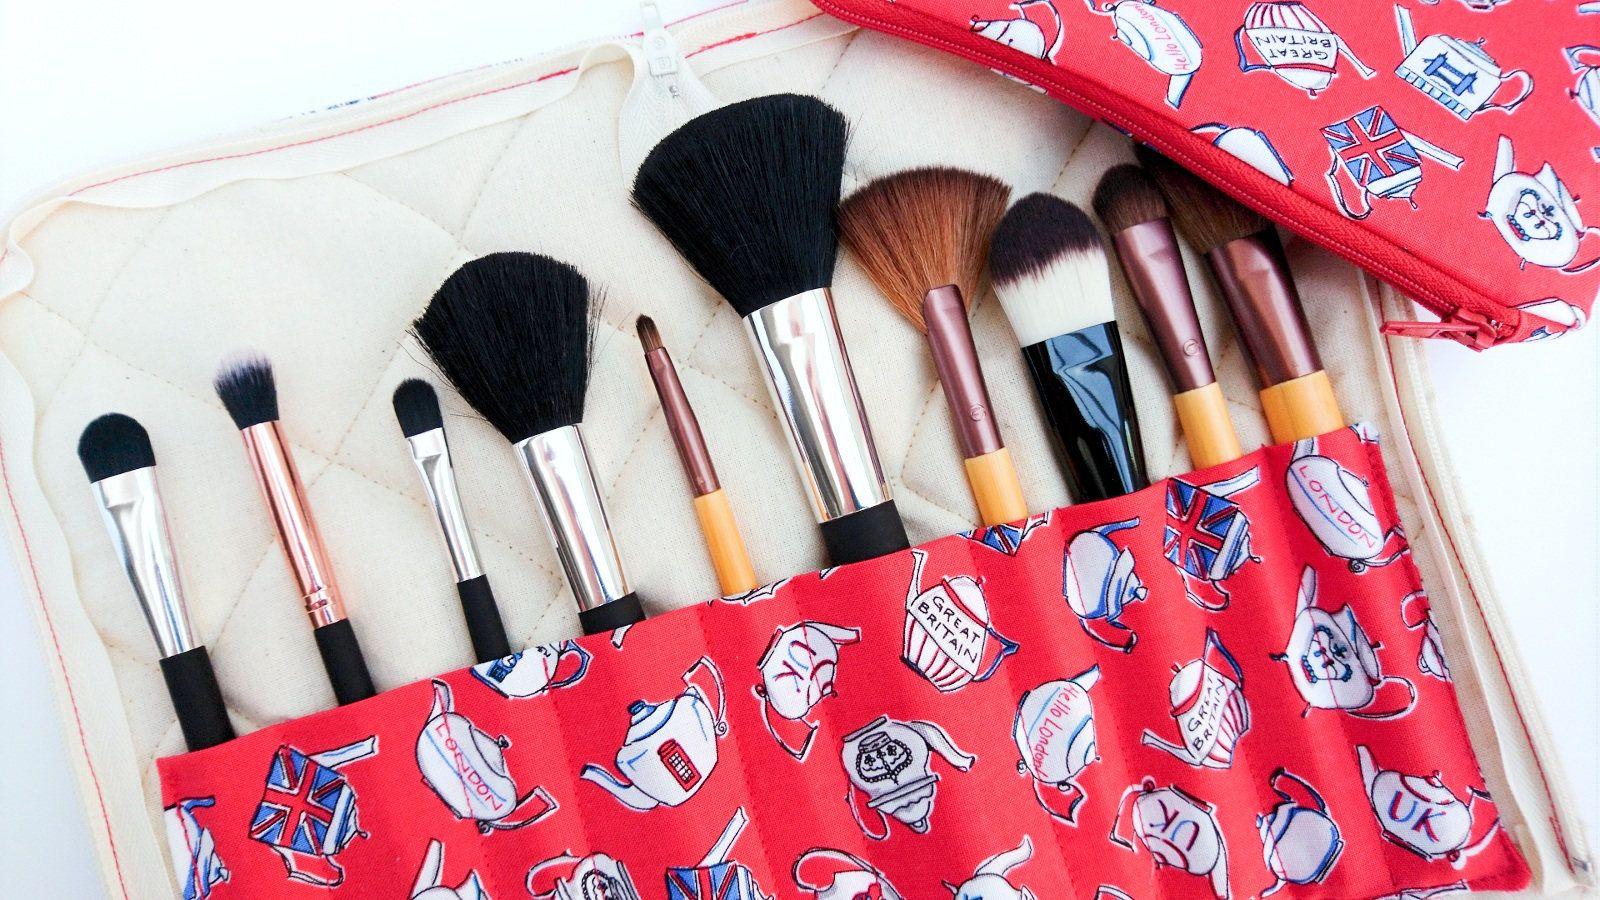 Makeup brush storage, brush organiser and bag, red brush